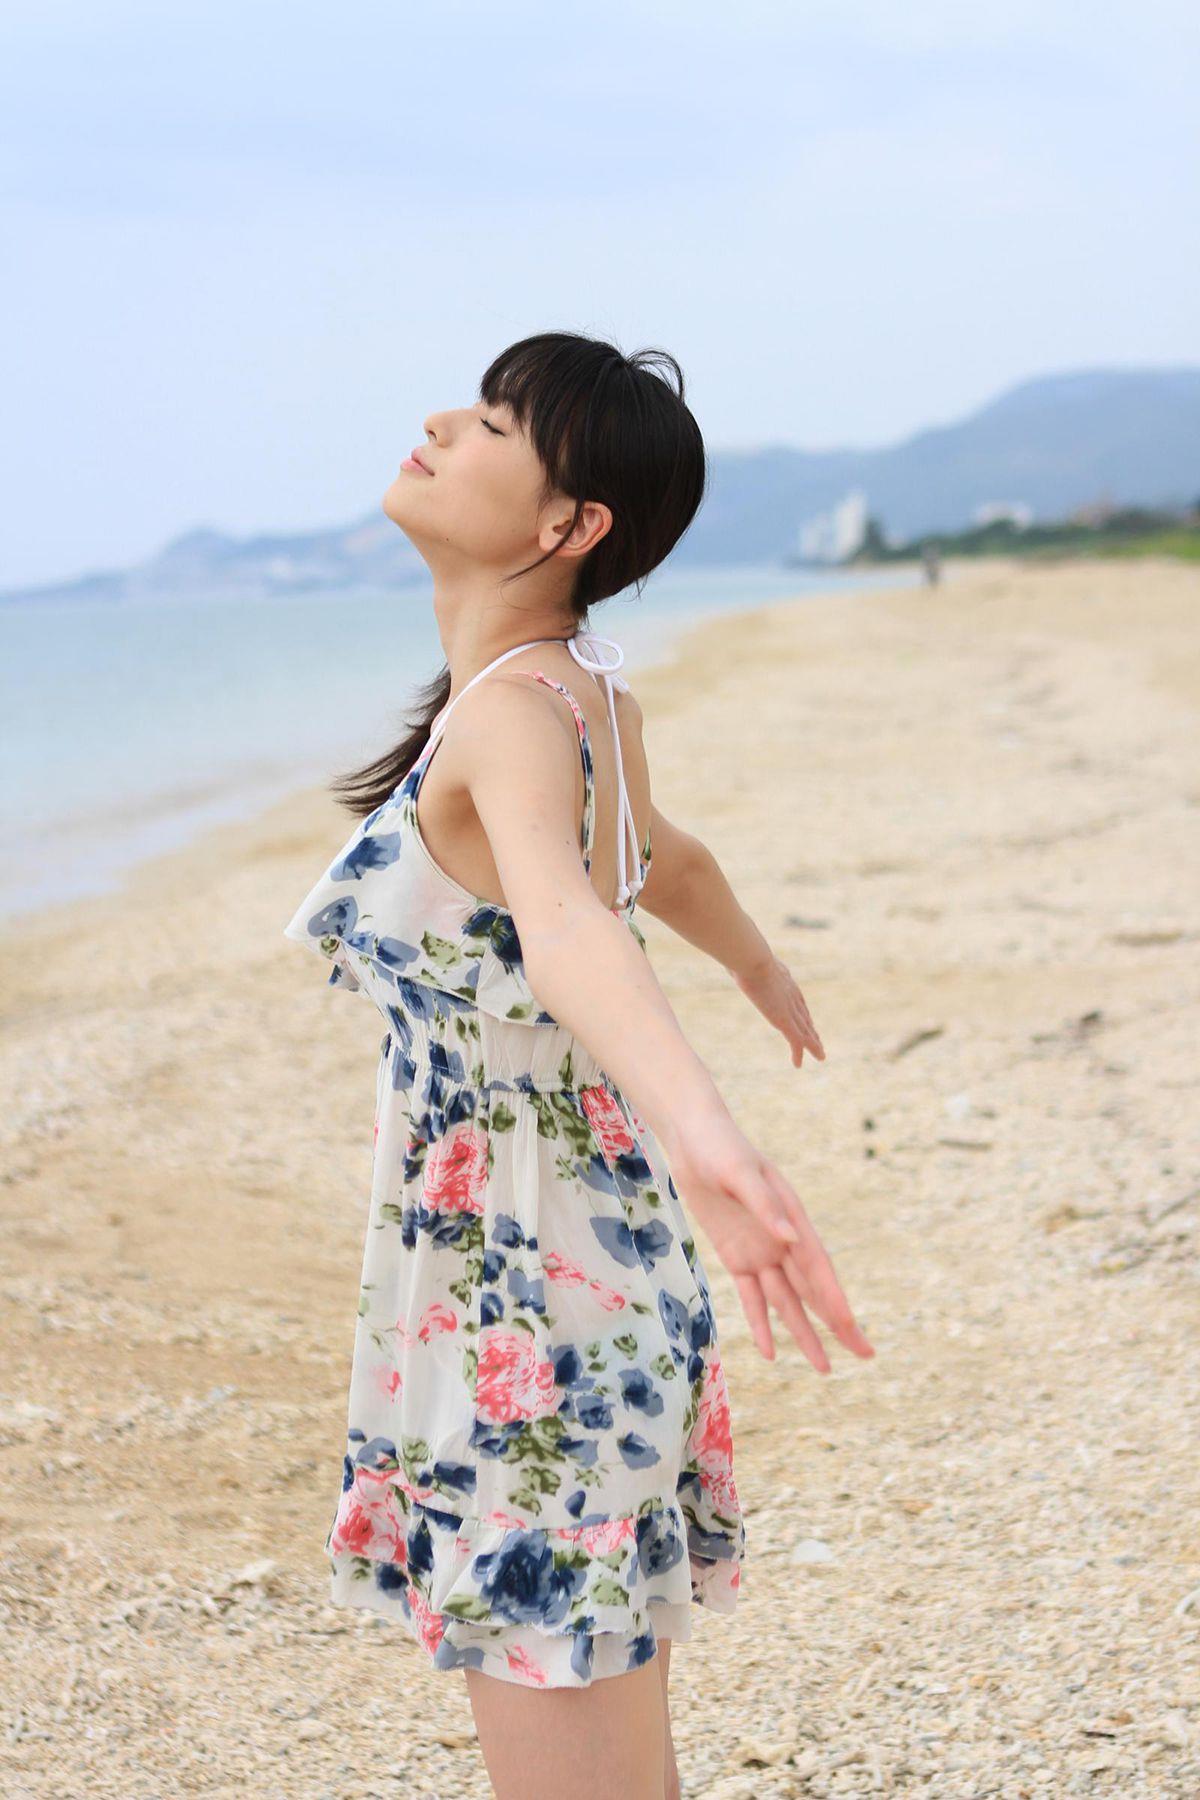 矢島舞美 エロ画像 5